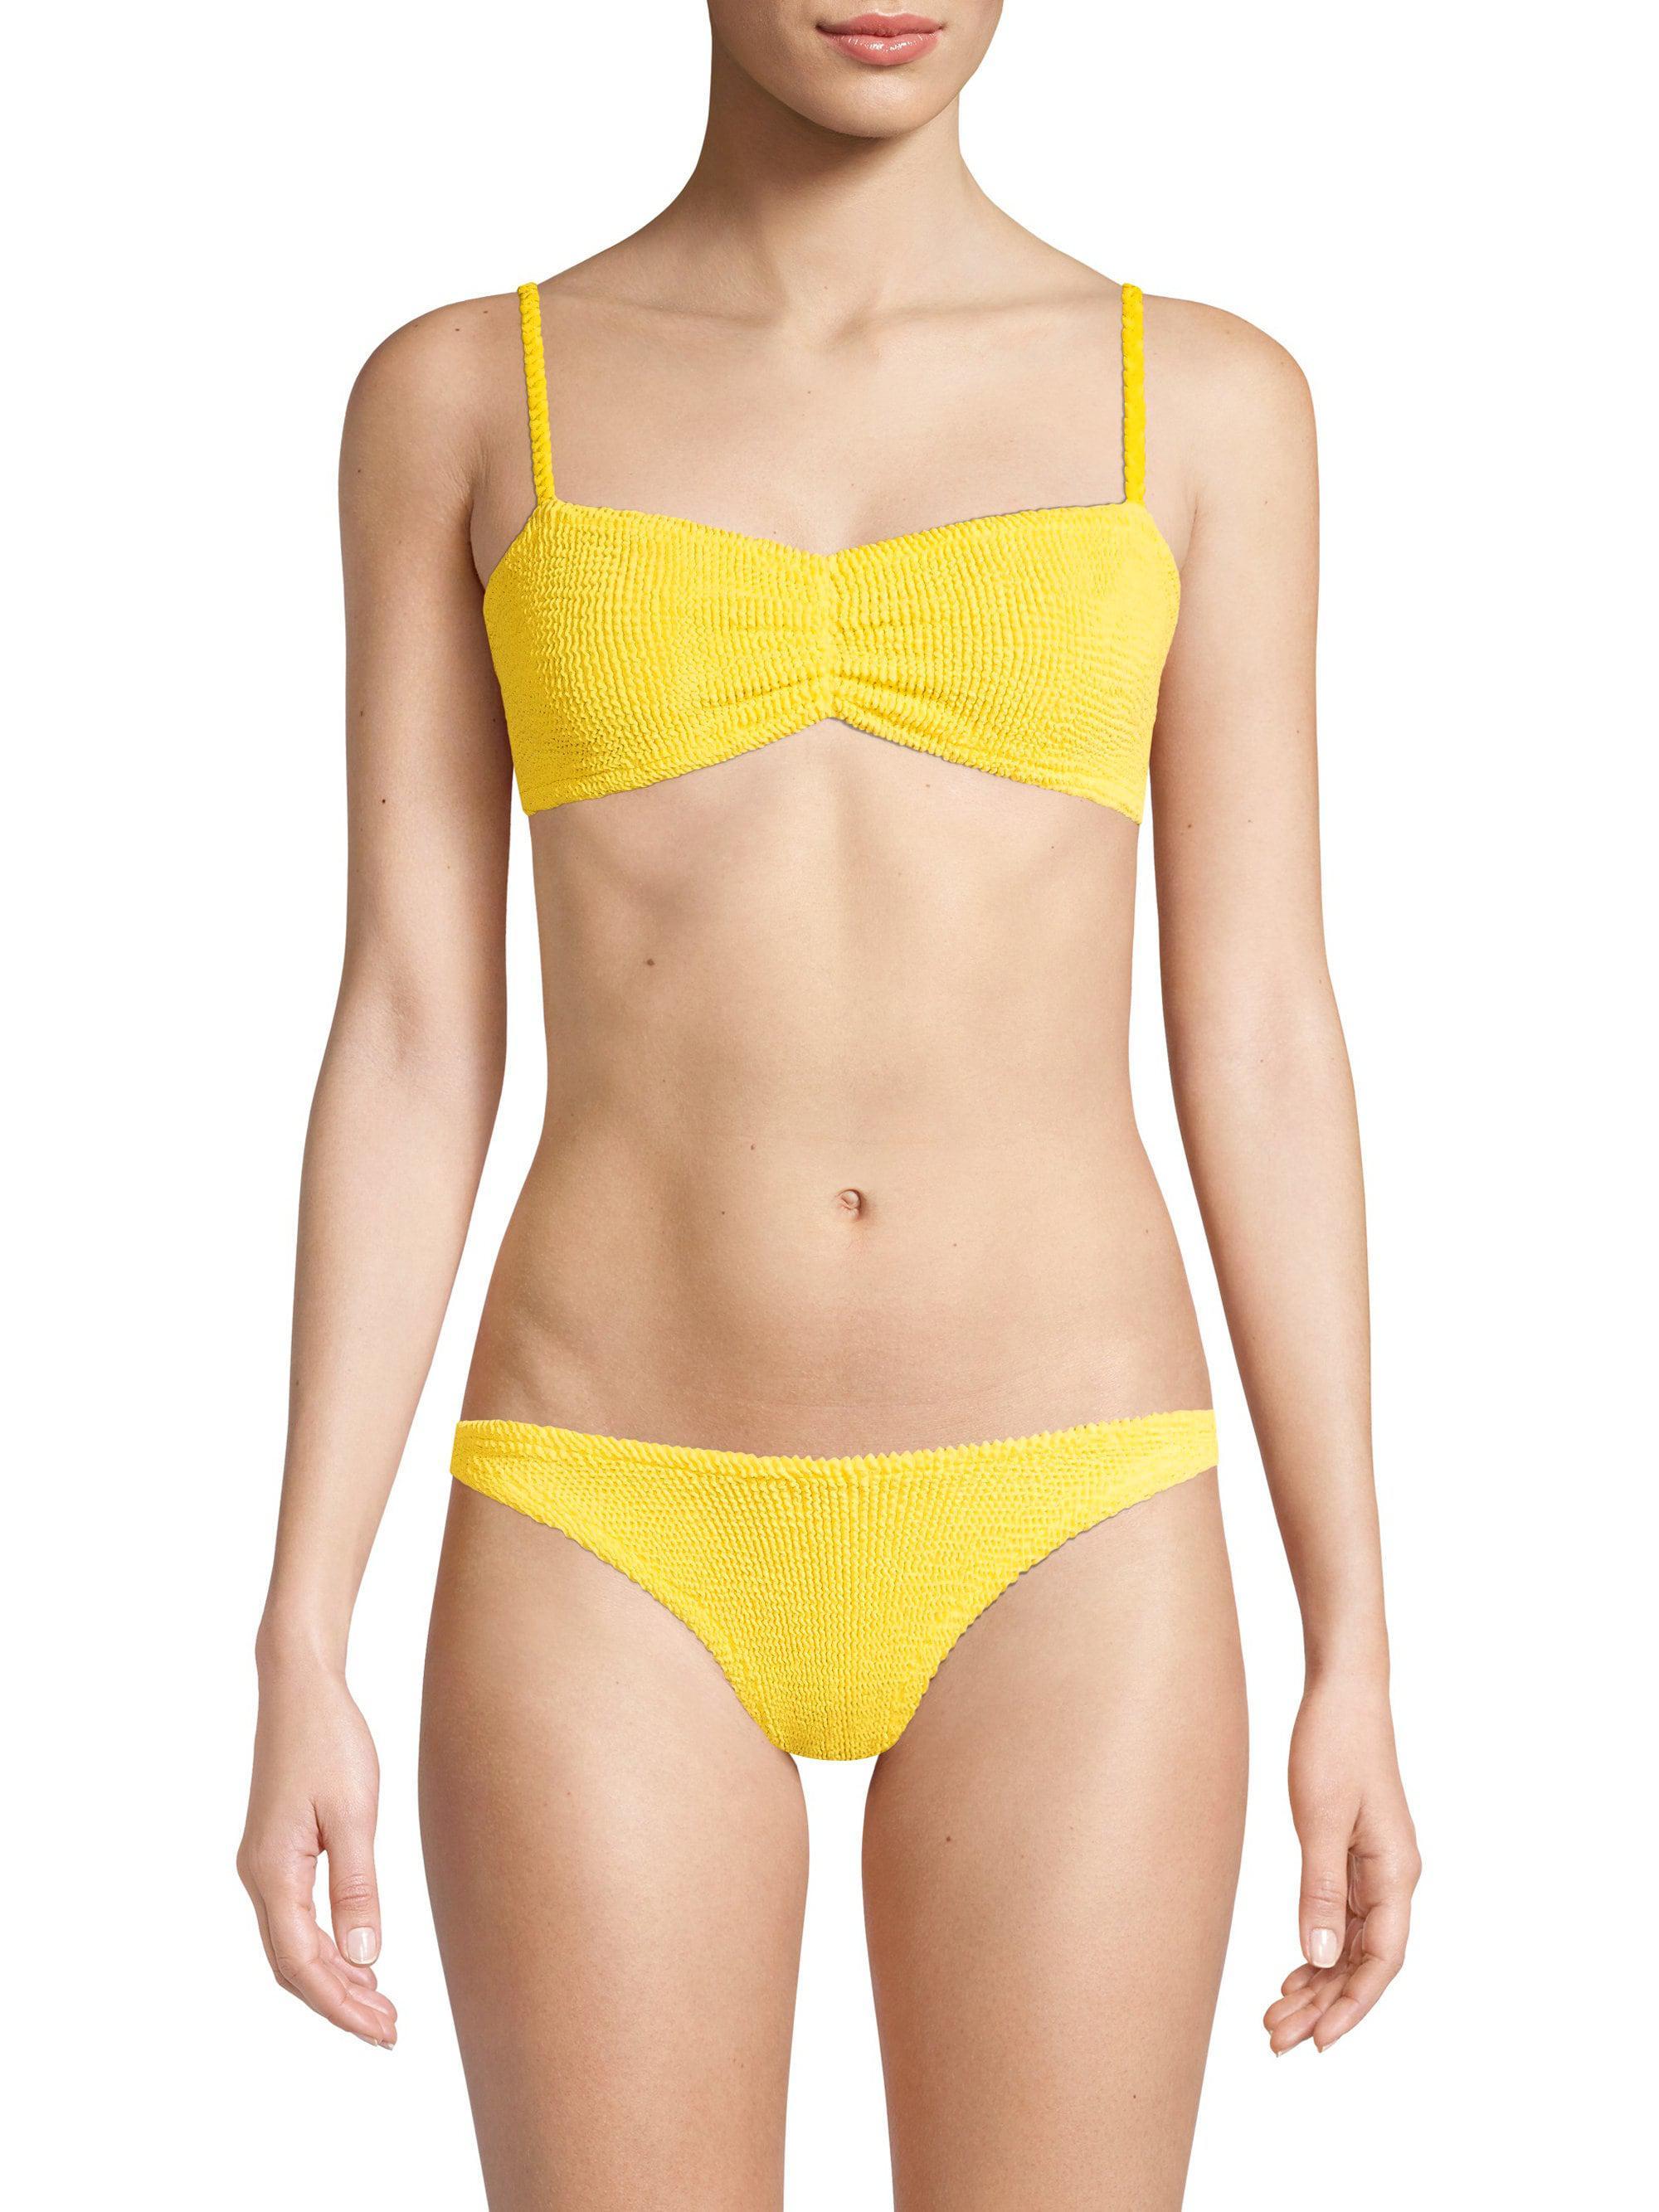 6c036f67e45bc Hunza G Women's Trina Two-piece Bikini - Yellow in Yellow - Lyst